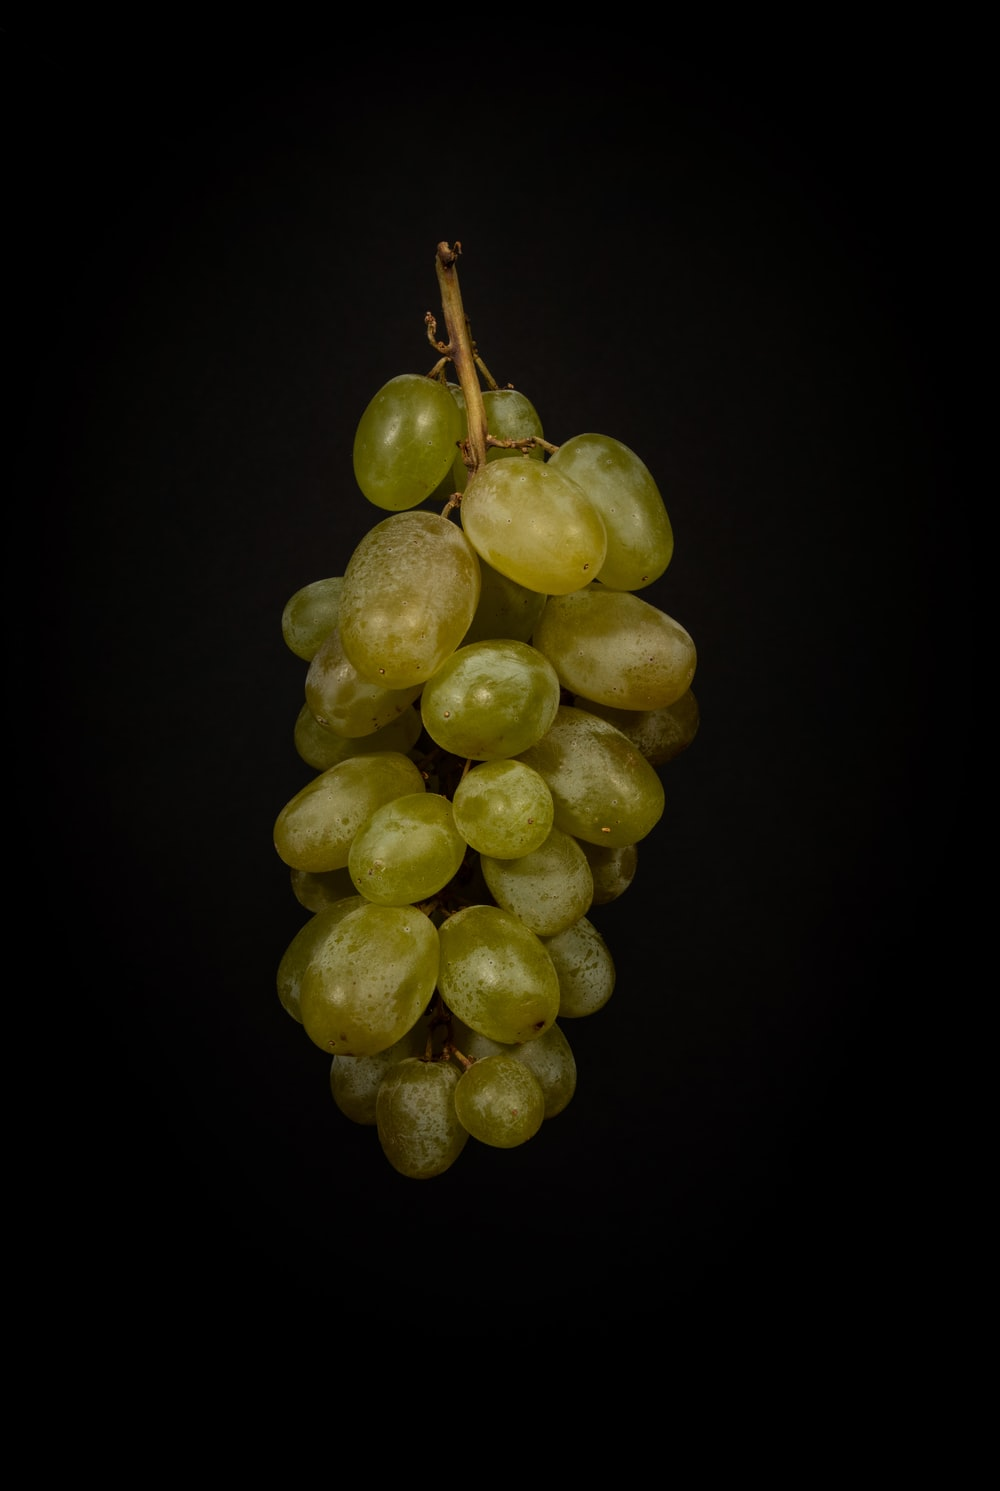 green grape fruits